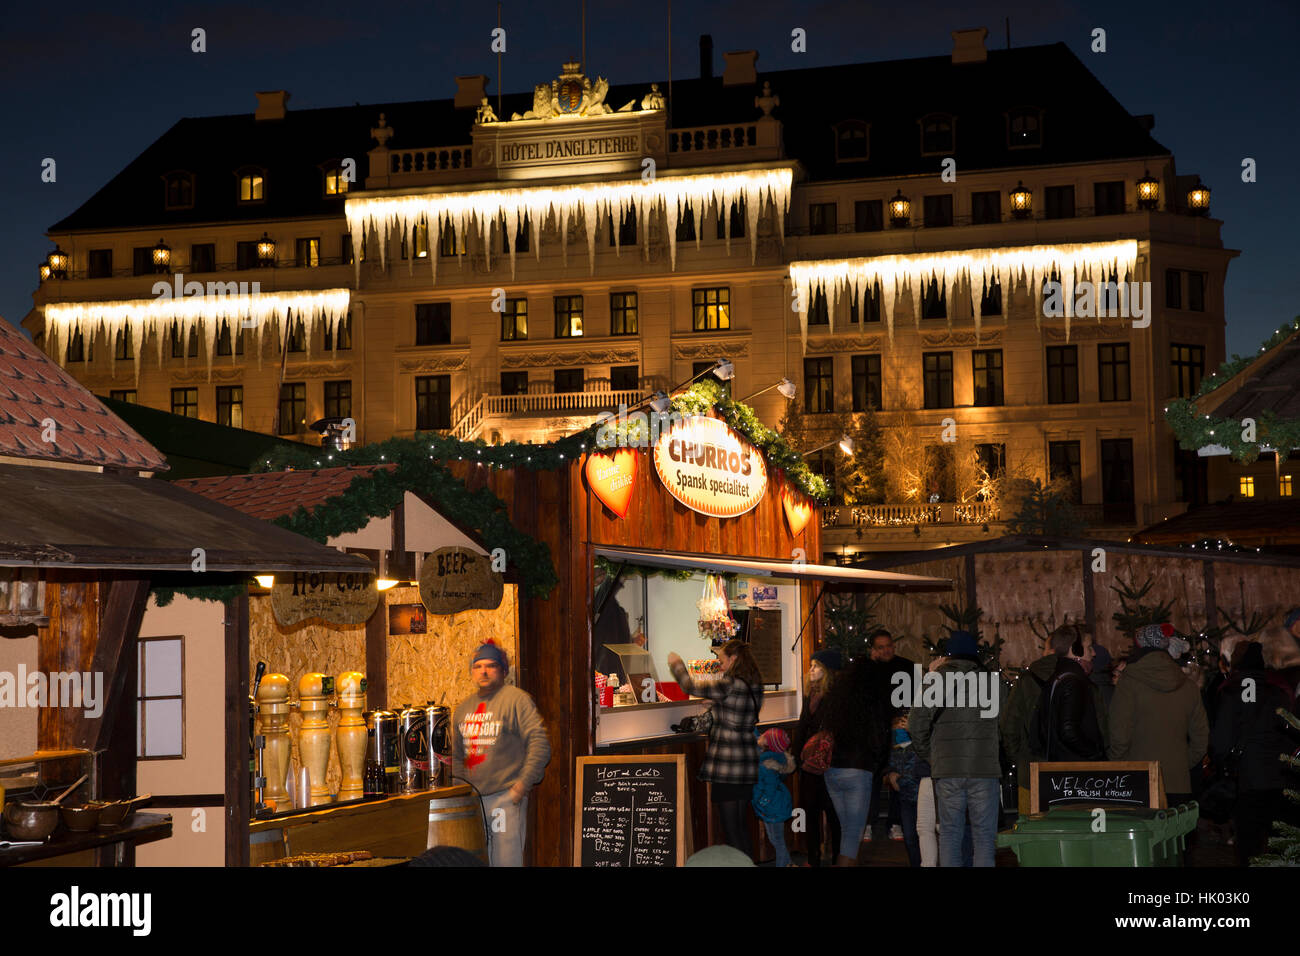 Denmark, Copenhagen, Kongens Nytorv, Xmas market and Hotel, d'Angleterre, Christmas decorations at night - Stock Image